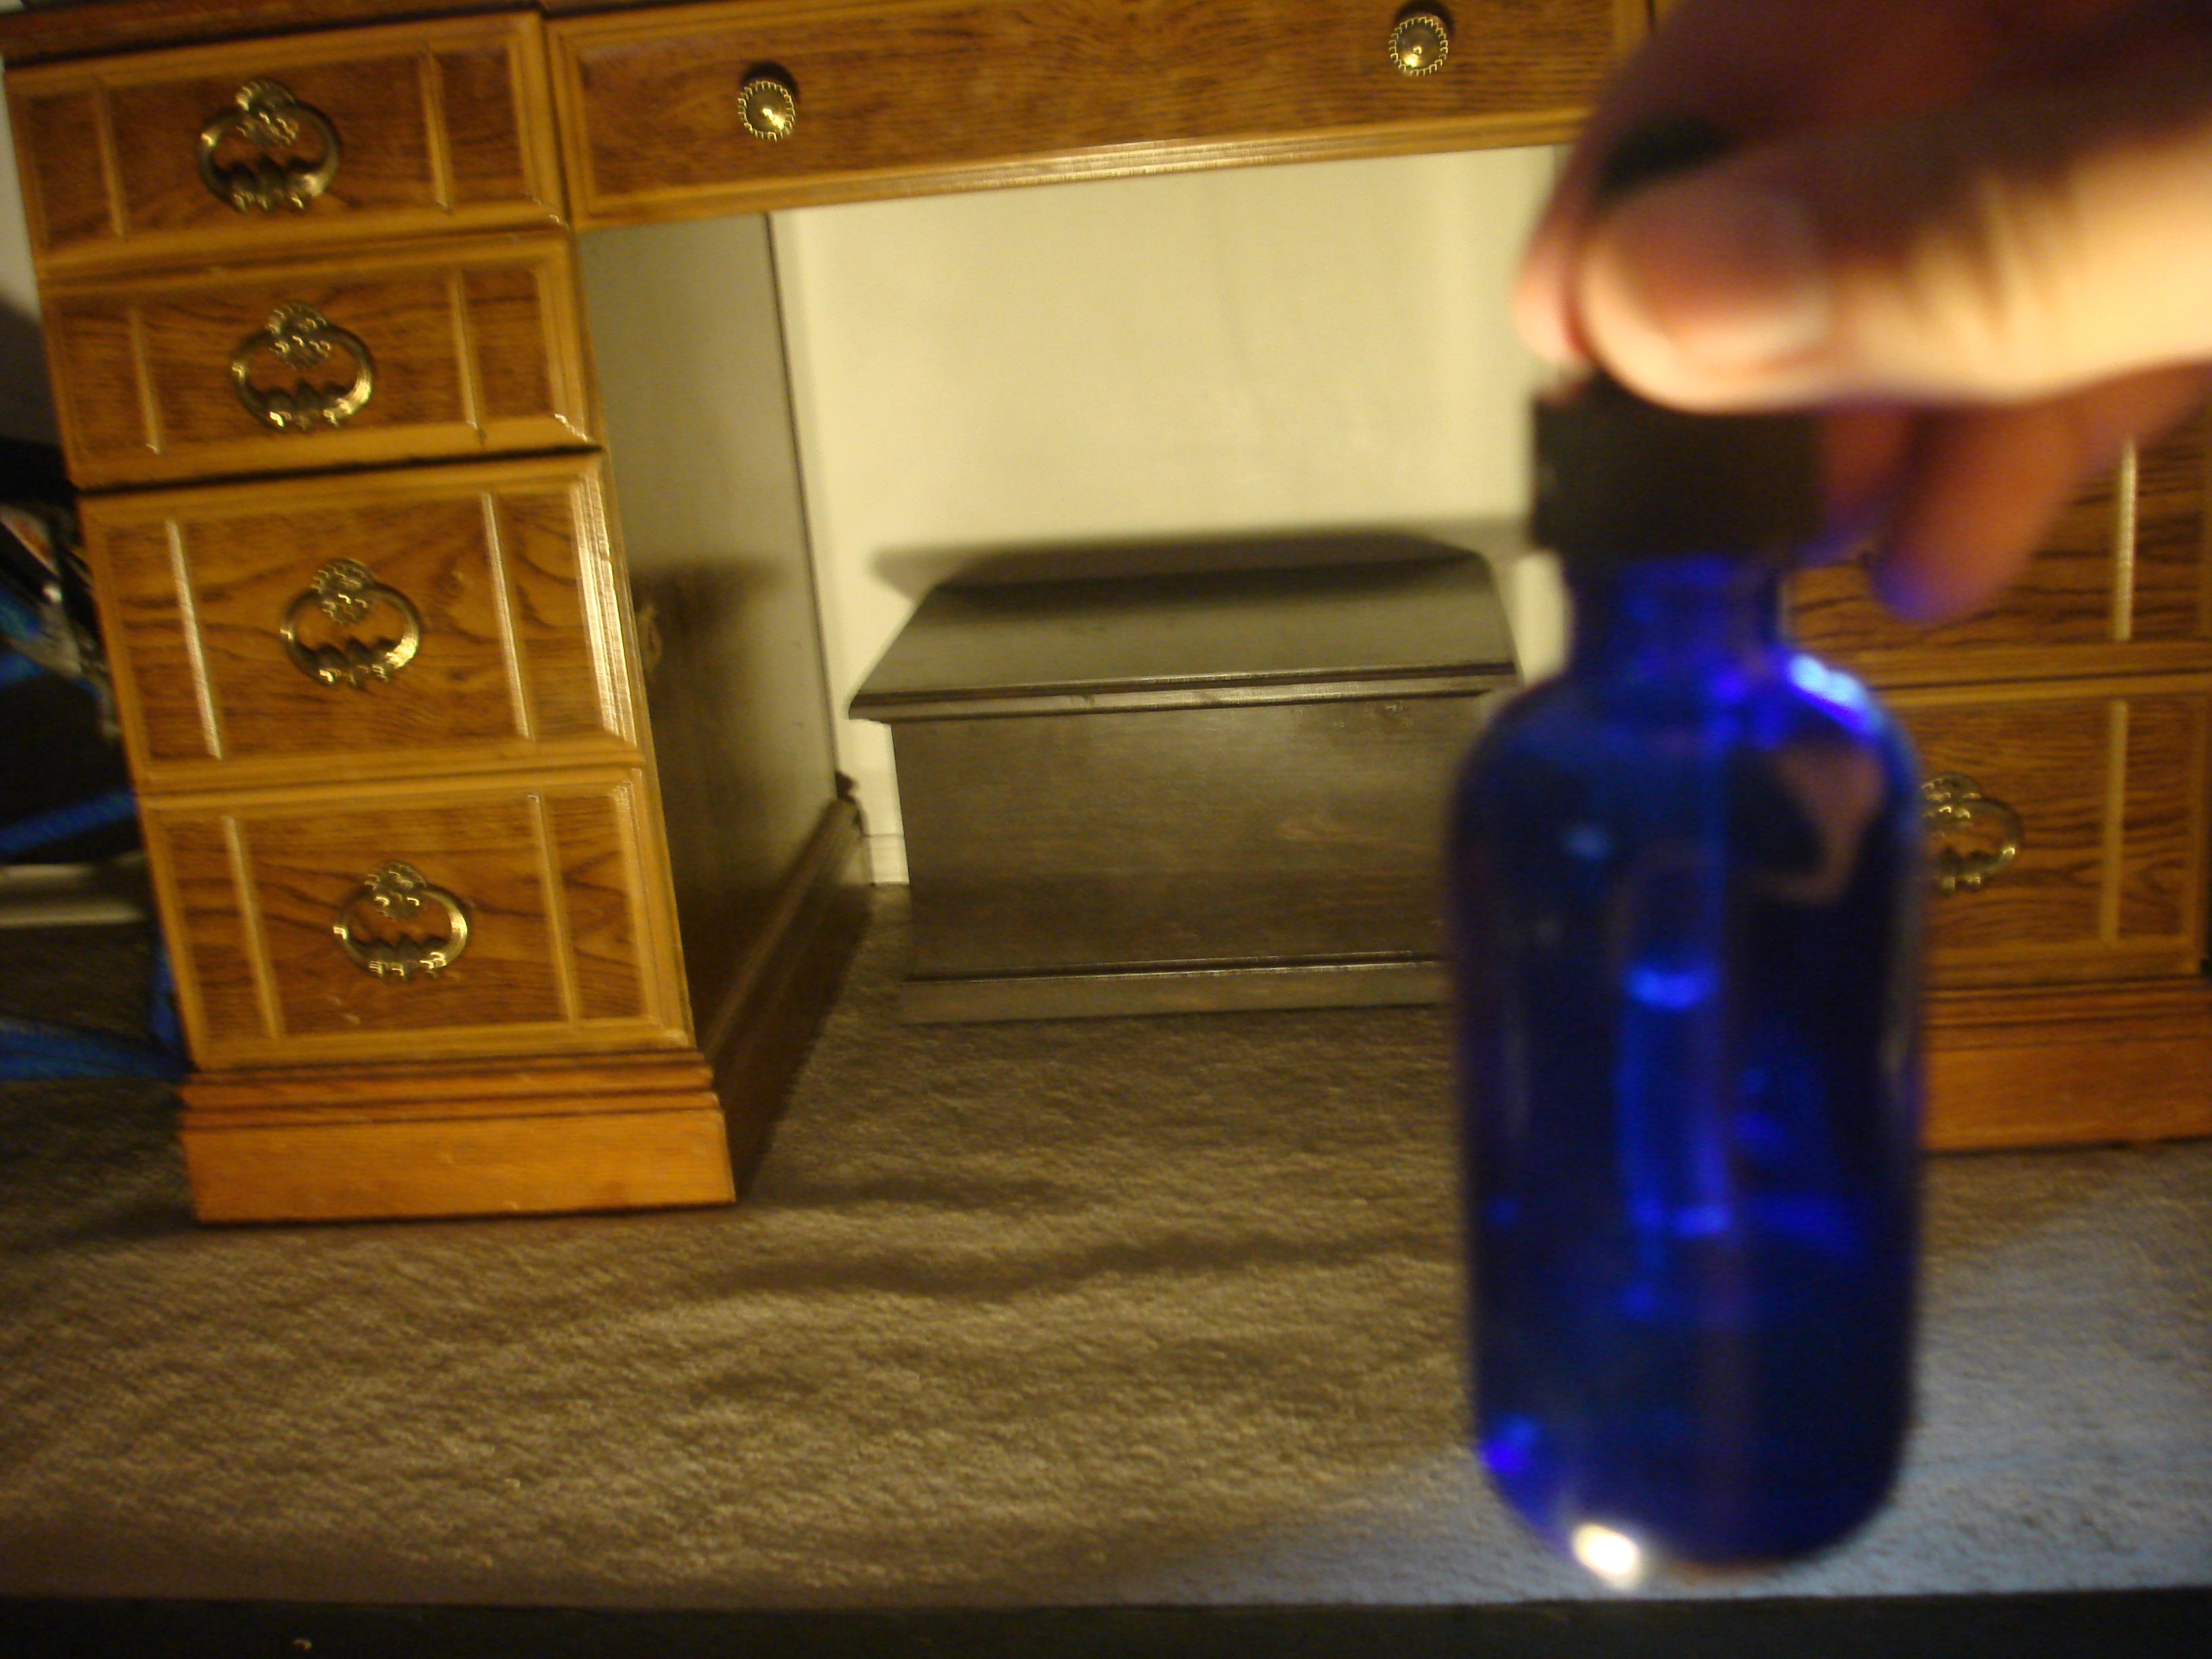 Distill Vodka To Make Everclear